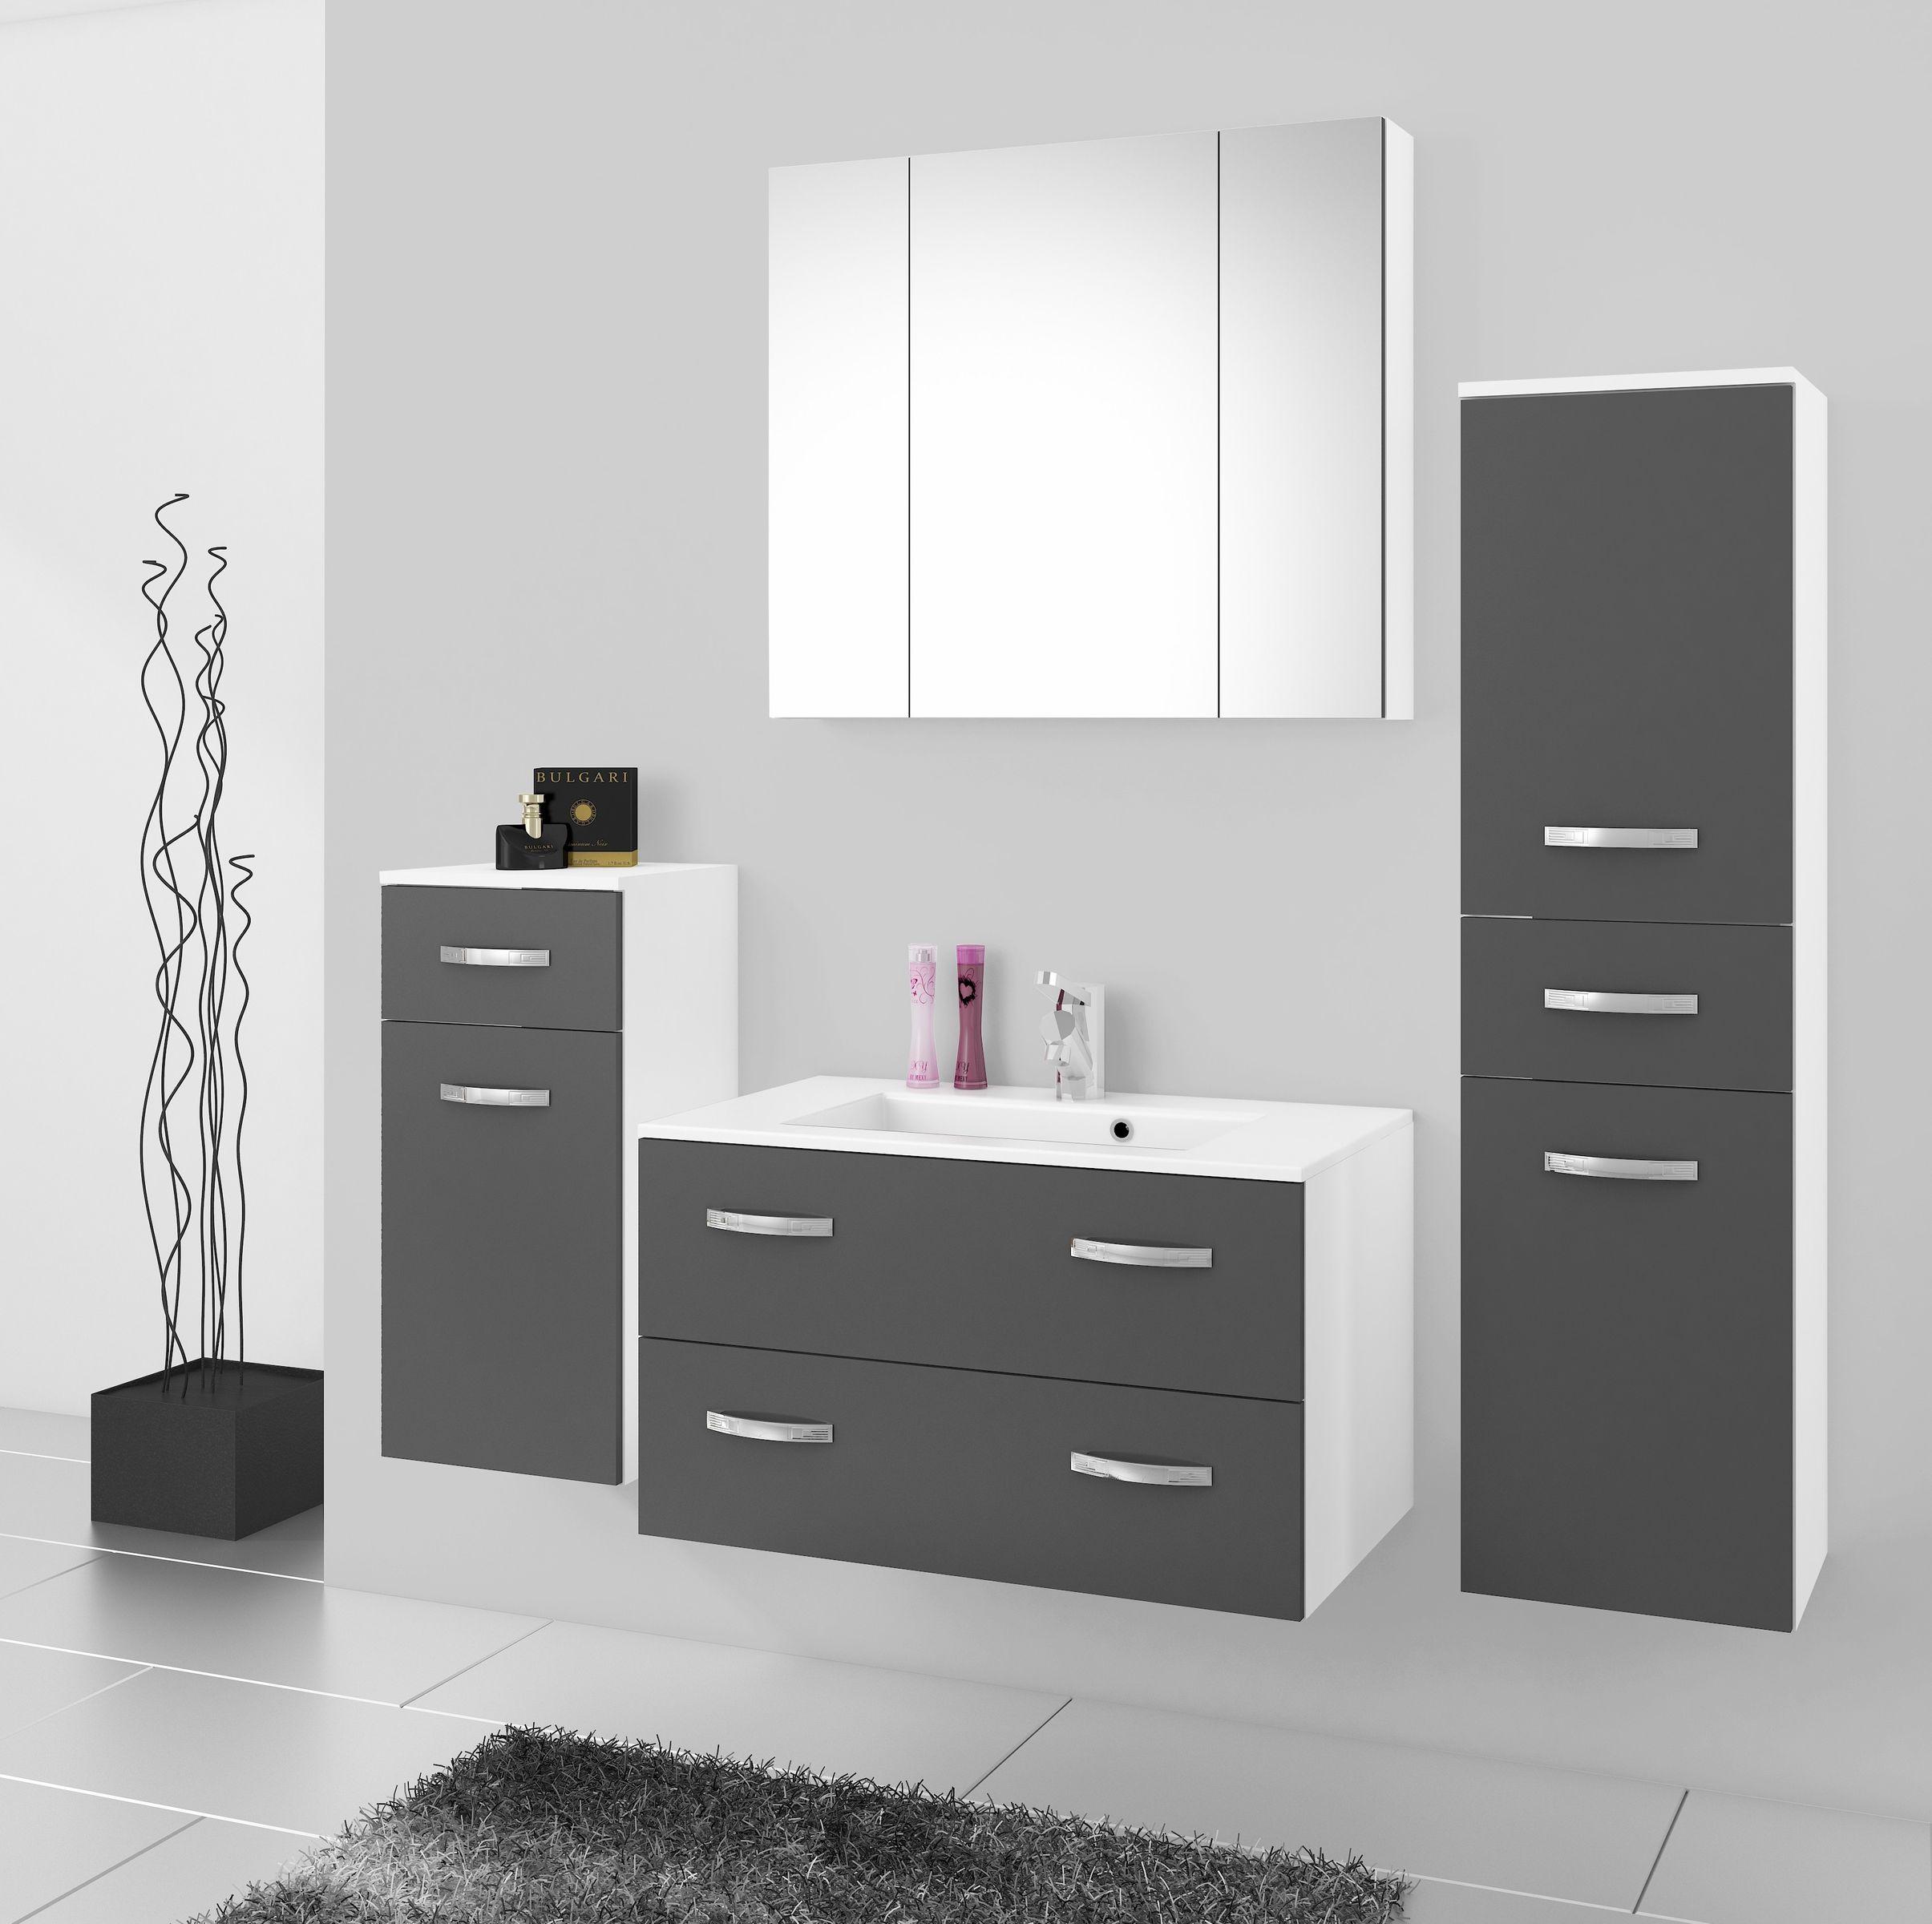 Sehr Badmöbel Badezimmer Regina 5tlg Set in Grau matt + Weiss matt 80 AB15